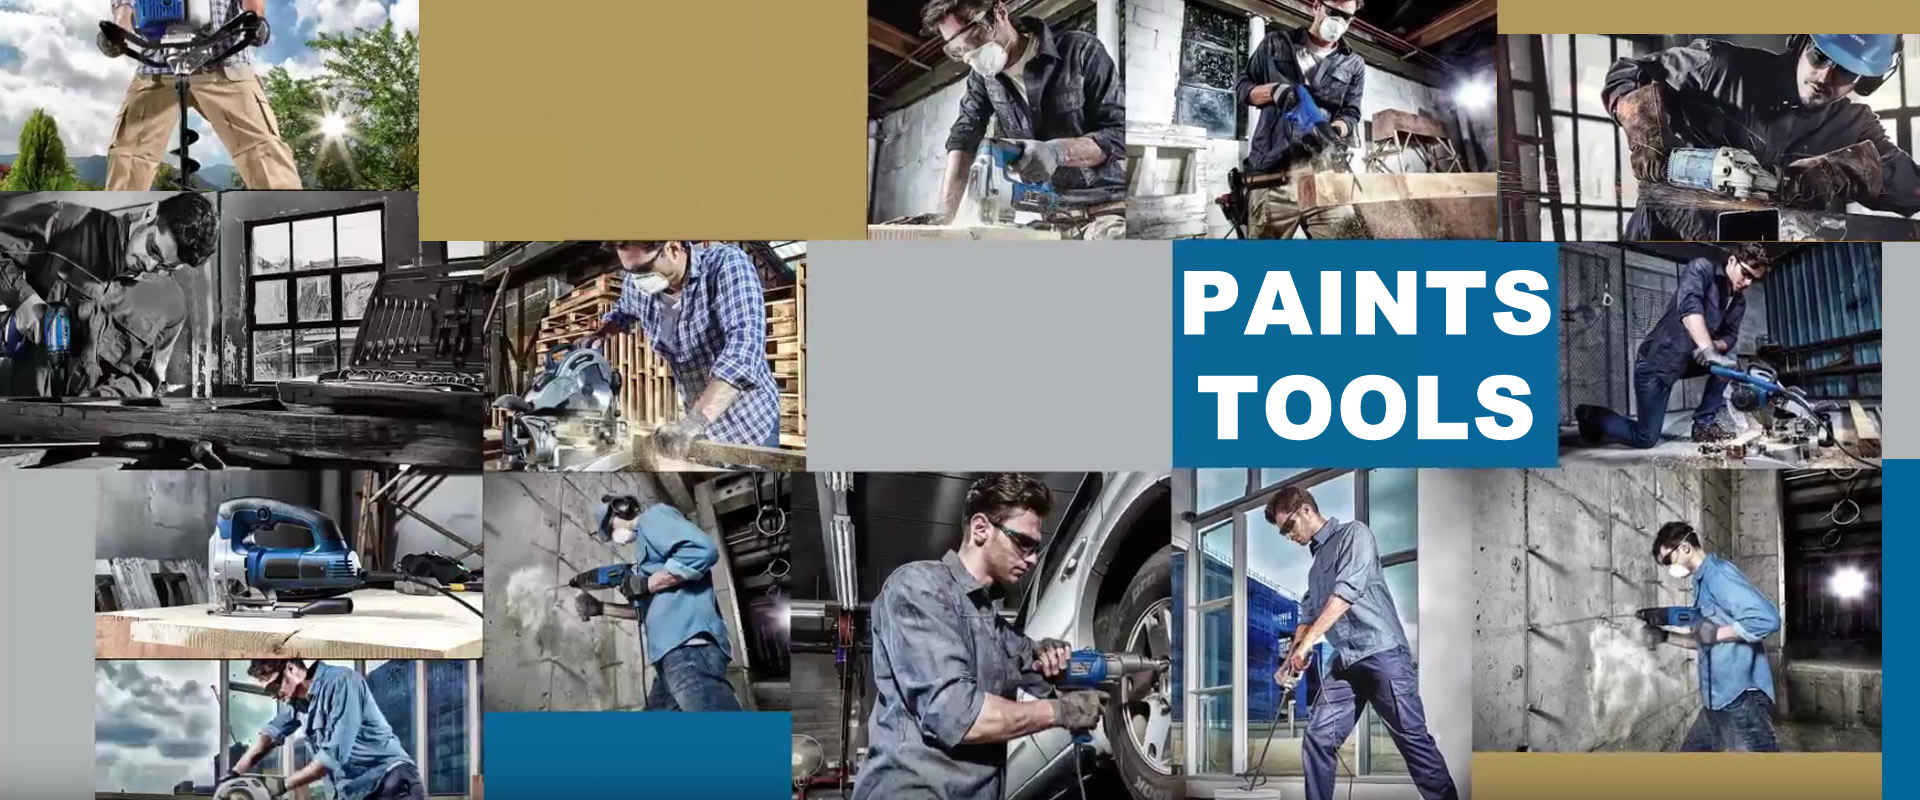 paints-tools